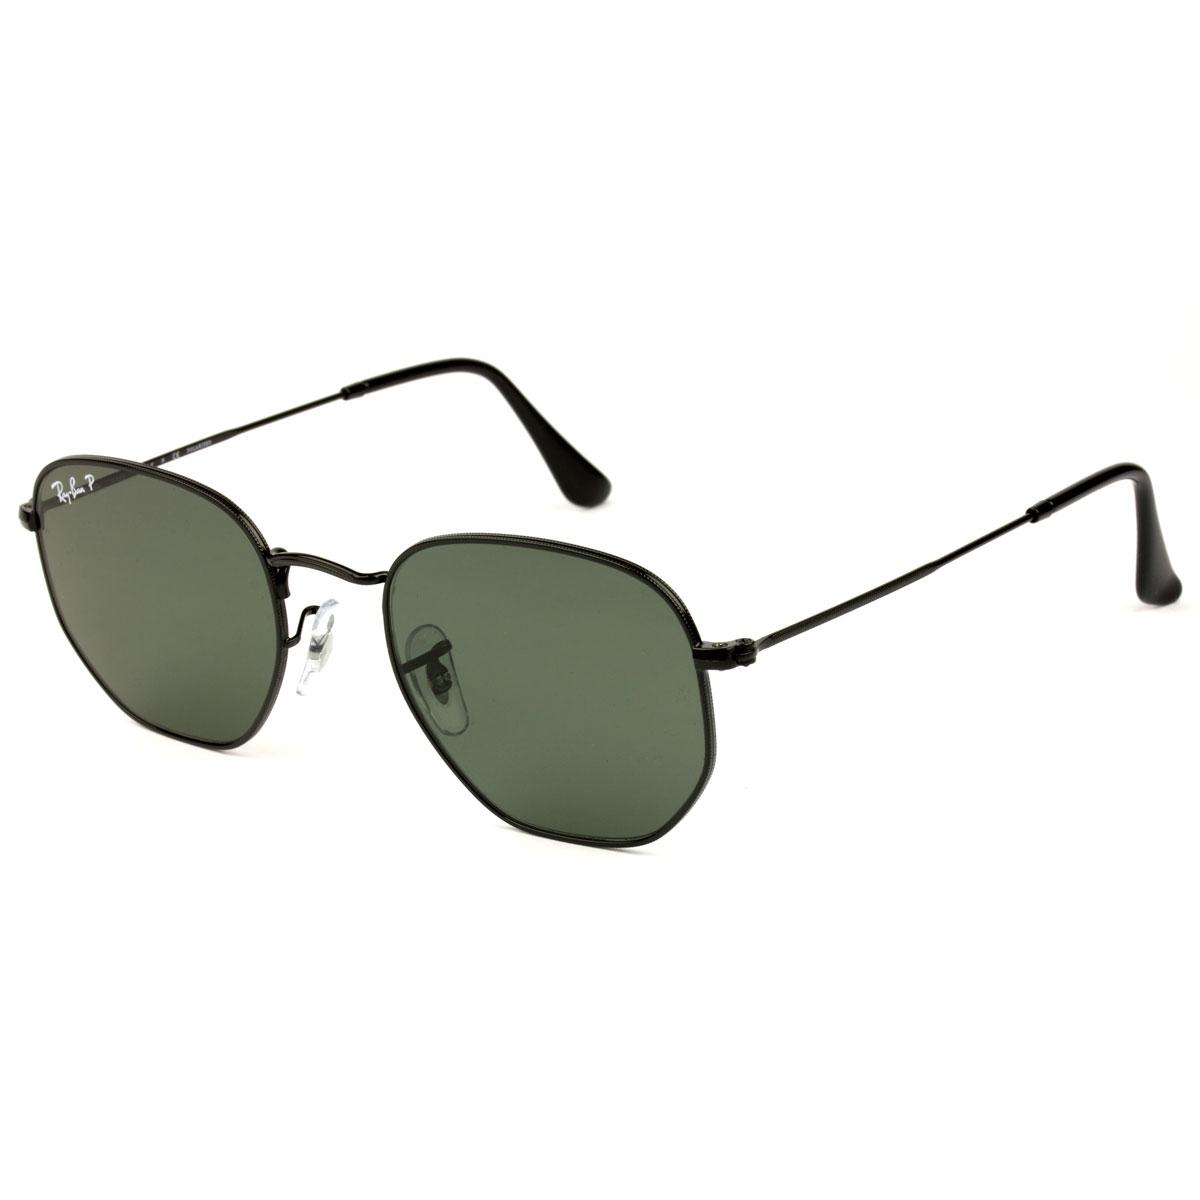 4768e4e862dbe Óculos de Sol Ray-Ban Hexagonal RB3548N 002 58 Polarizado Produto não  disponível